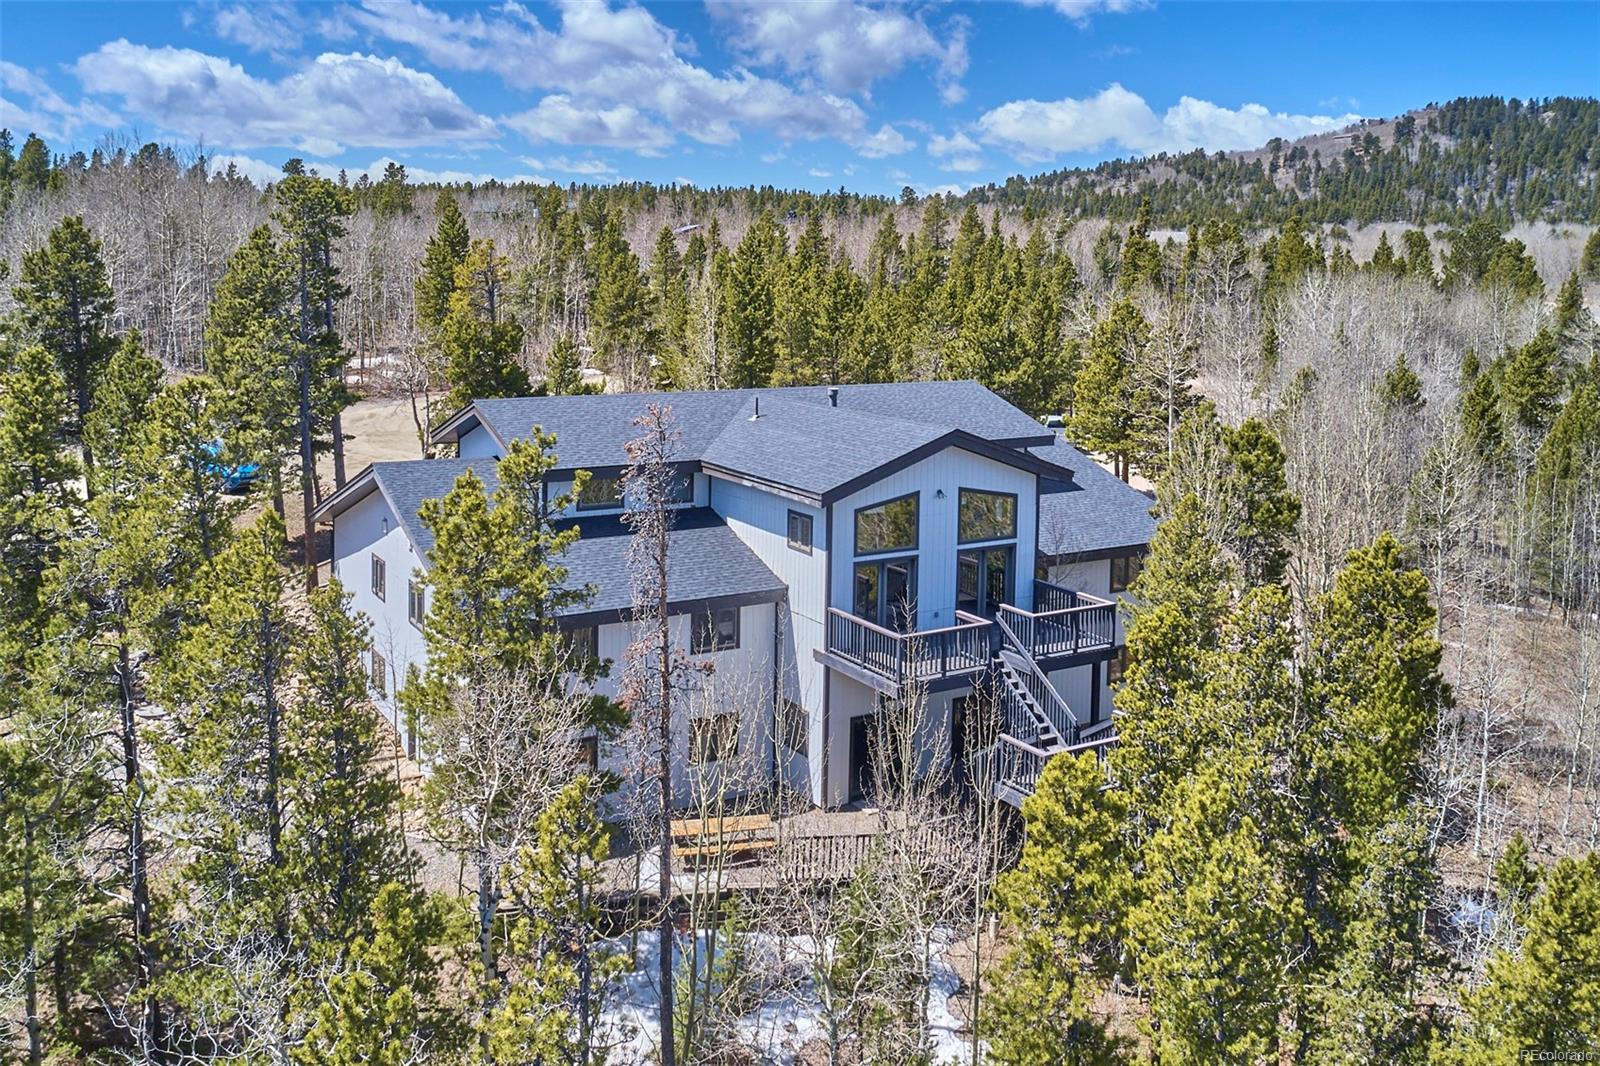 972 Golden Gate Canyon Road, Black Hawk, CO 80422 - Black Hawk, CO real estate listing